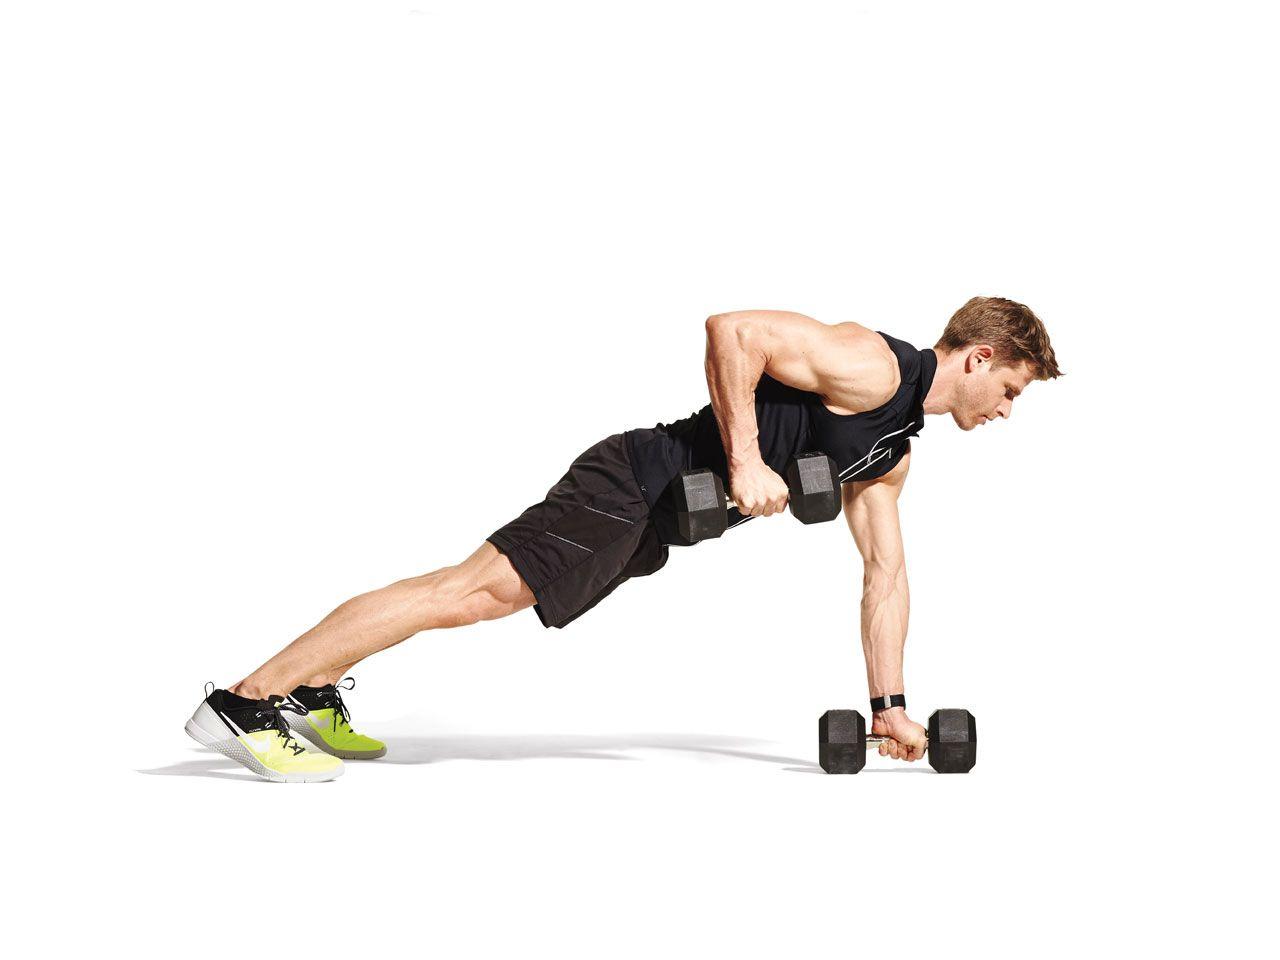 Renegade Row | Renegade rows, Dumbbell workout, Workout